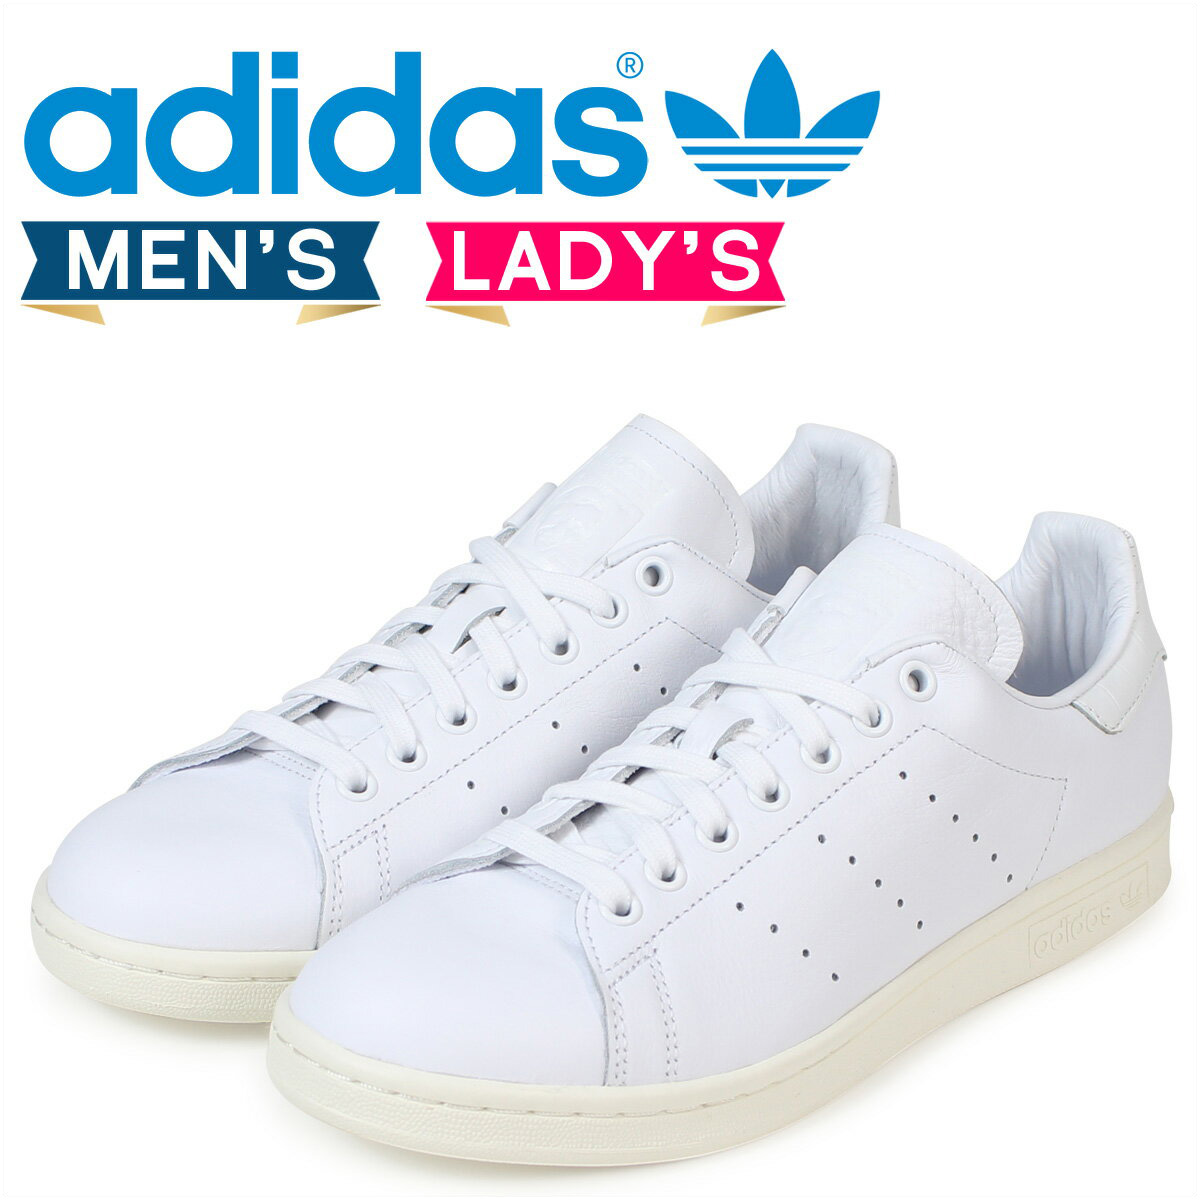 quality design 1612c 28043 adidas originals originals Stan Smith Adidas STAN SMITH Lady's men sneakers  BZ0466 shoes white white